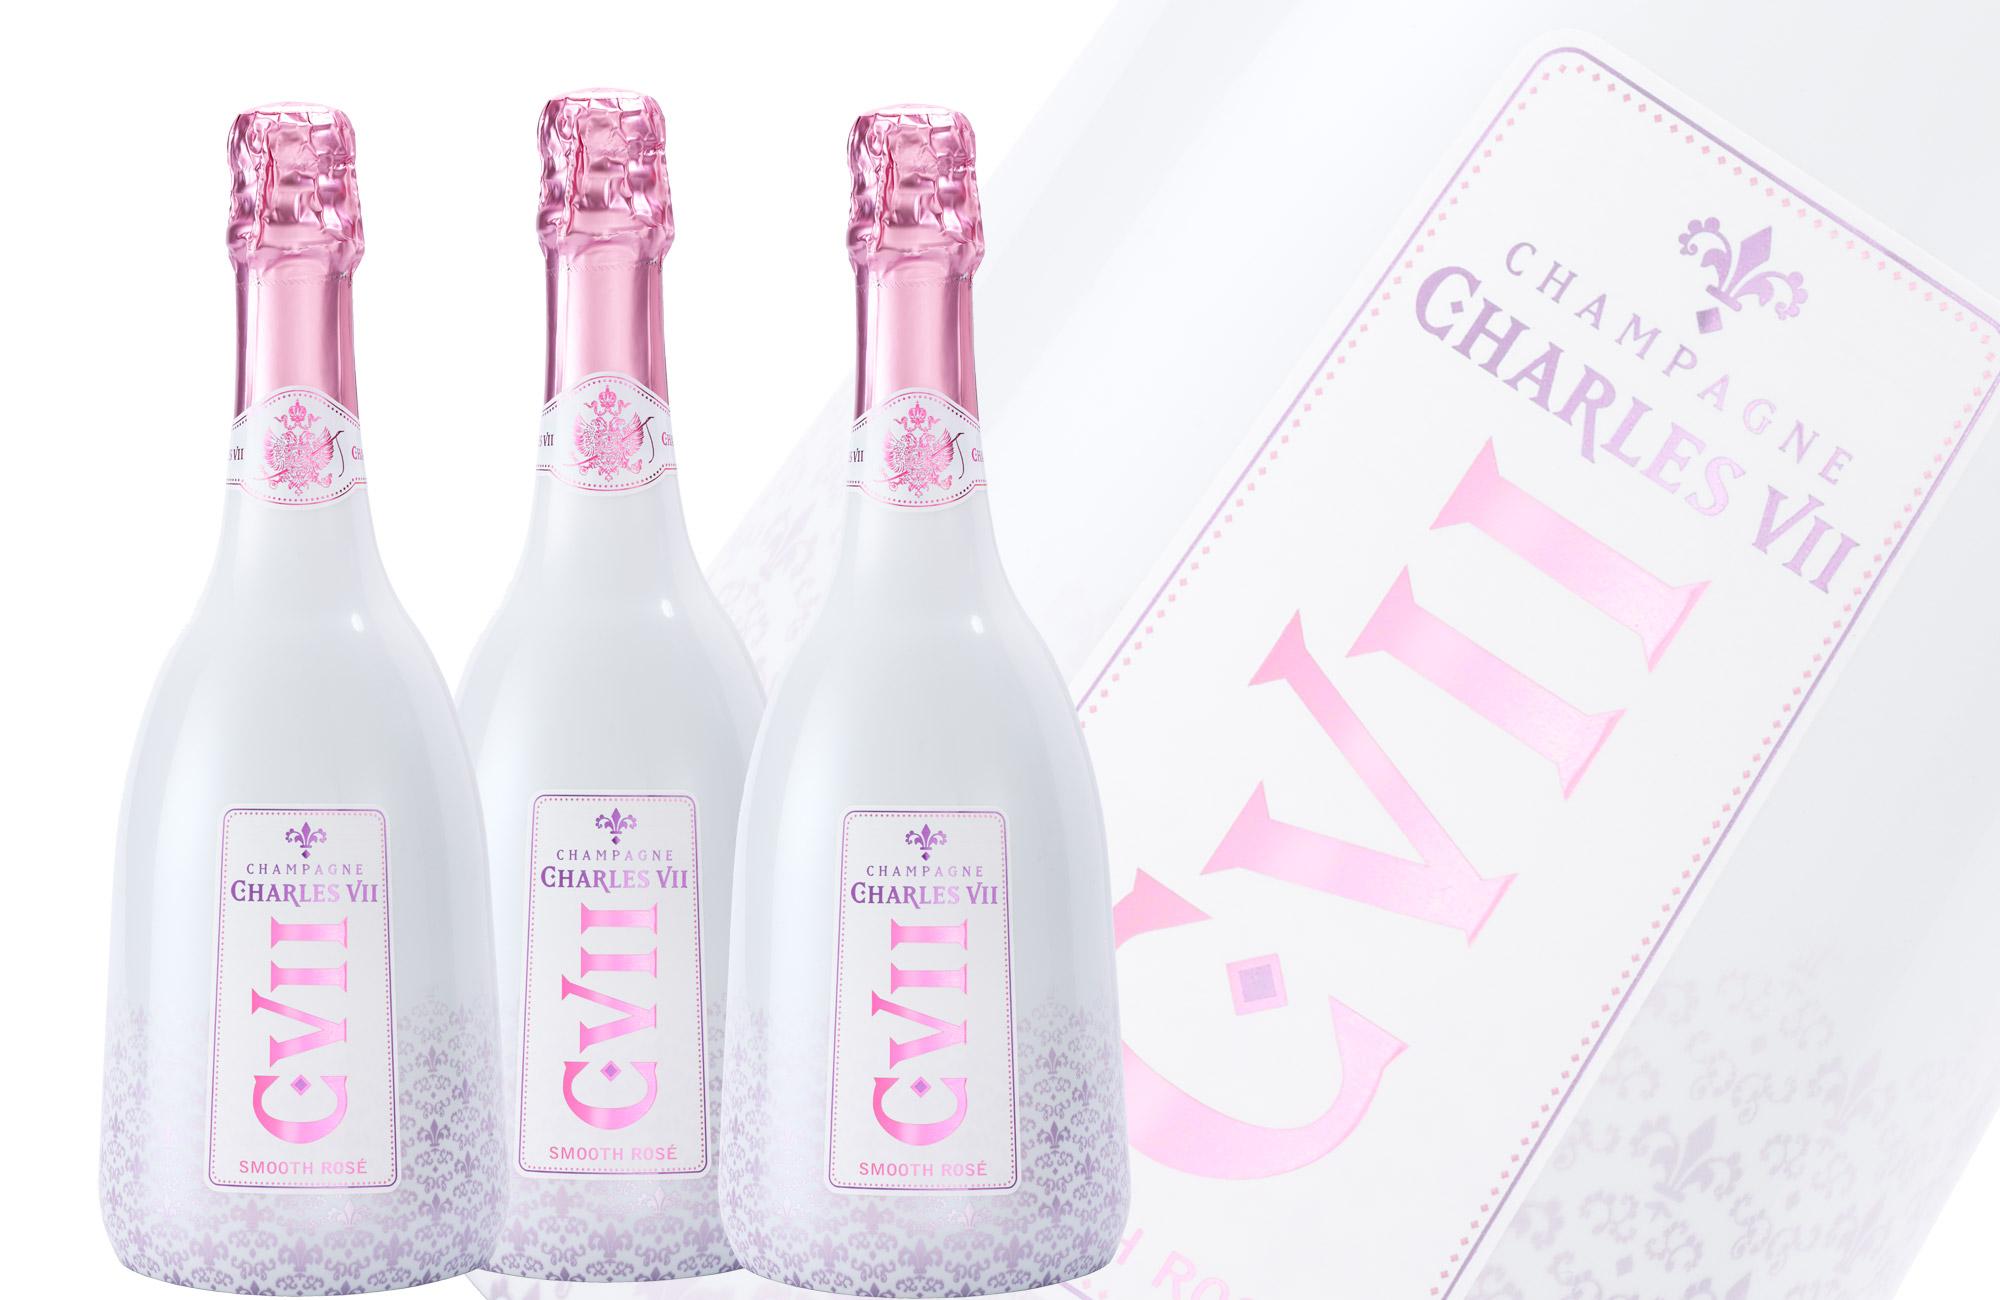 Canard-Duchene Charles VII Grande Cuvee Smooth Rose, Champagne